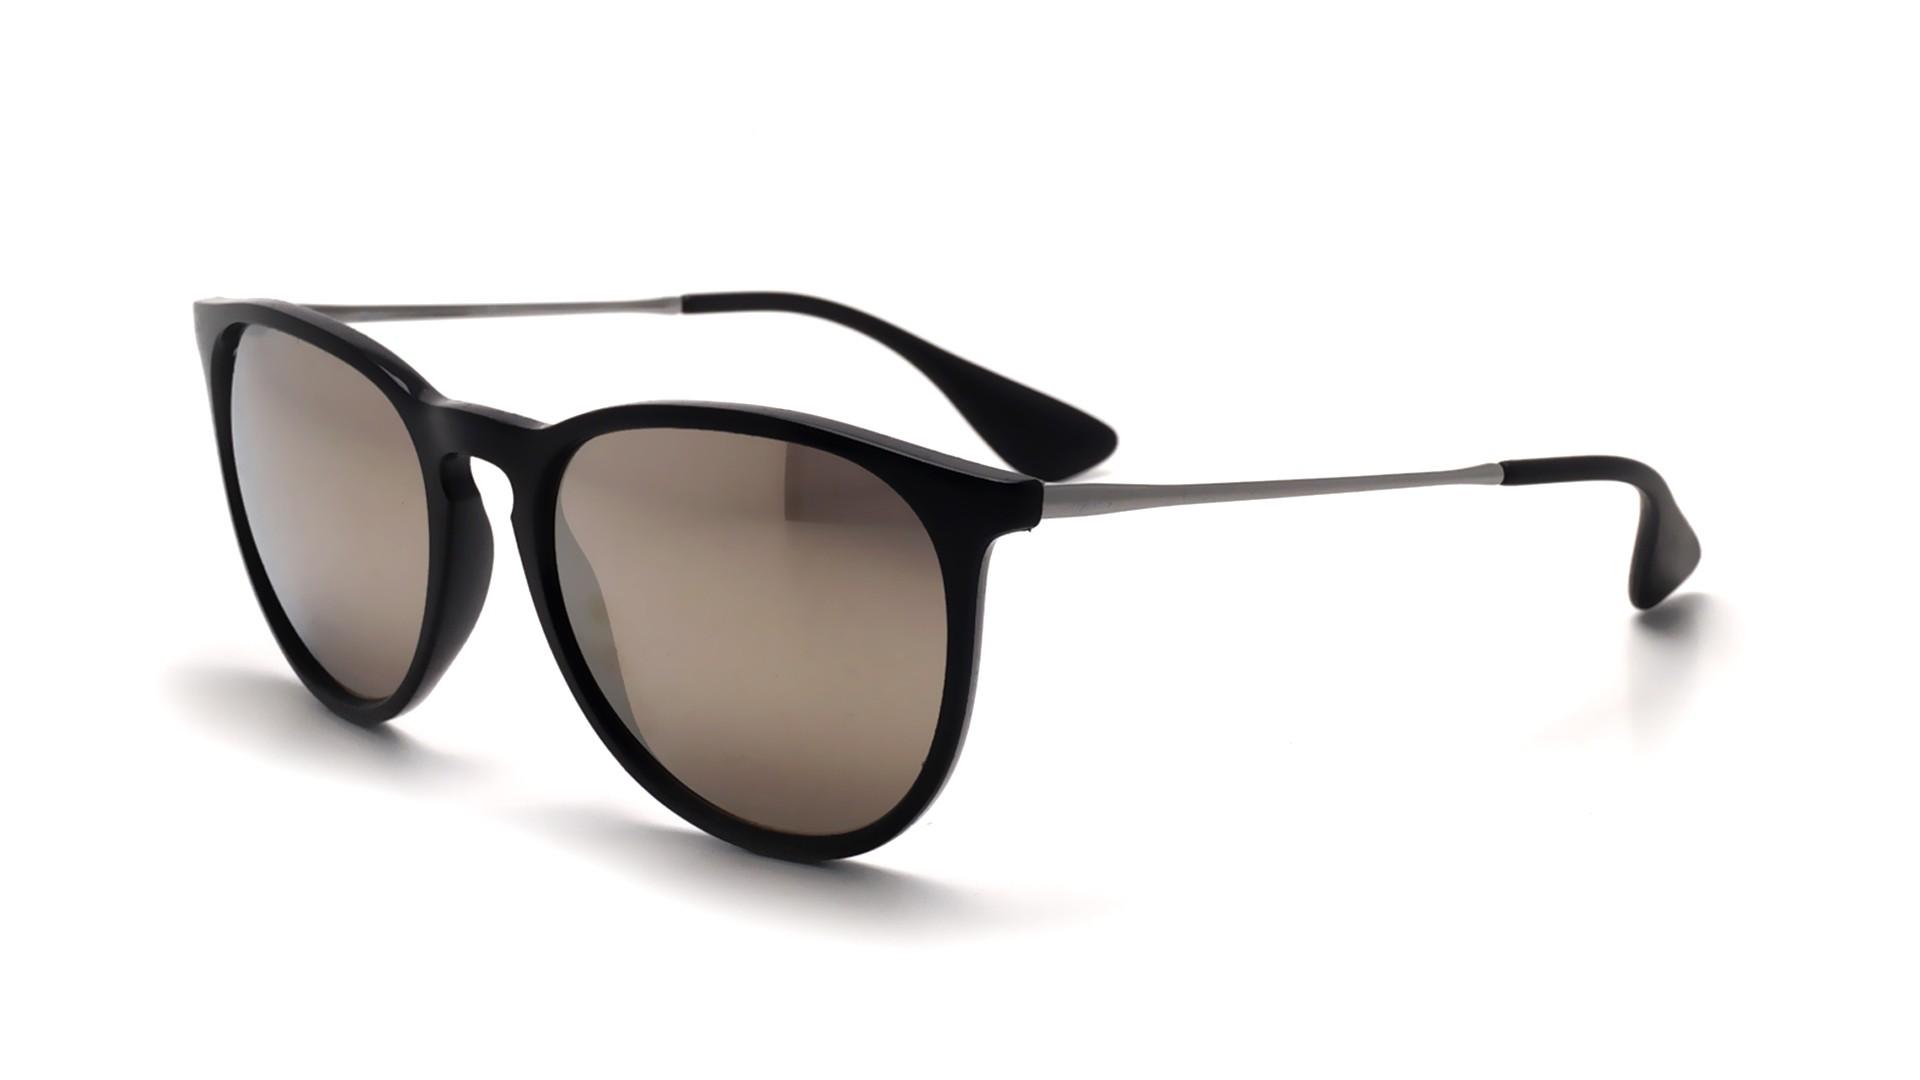 Sunglasses Ray-Ban Erika Black RB4171 601 5A 54-18 Medium Mirror d8acf0ca2409